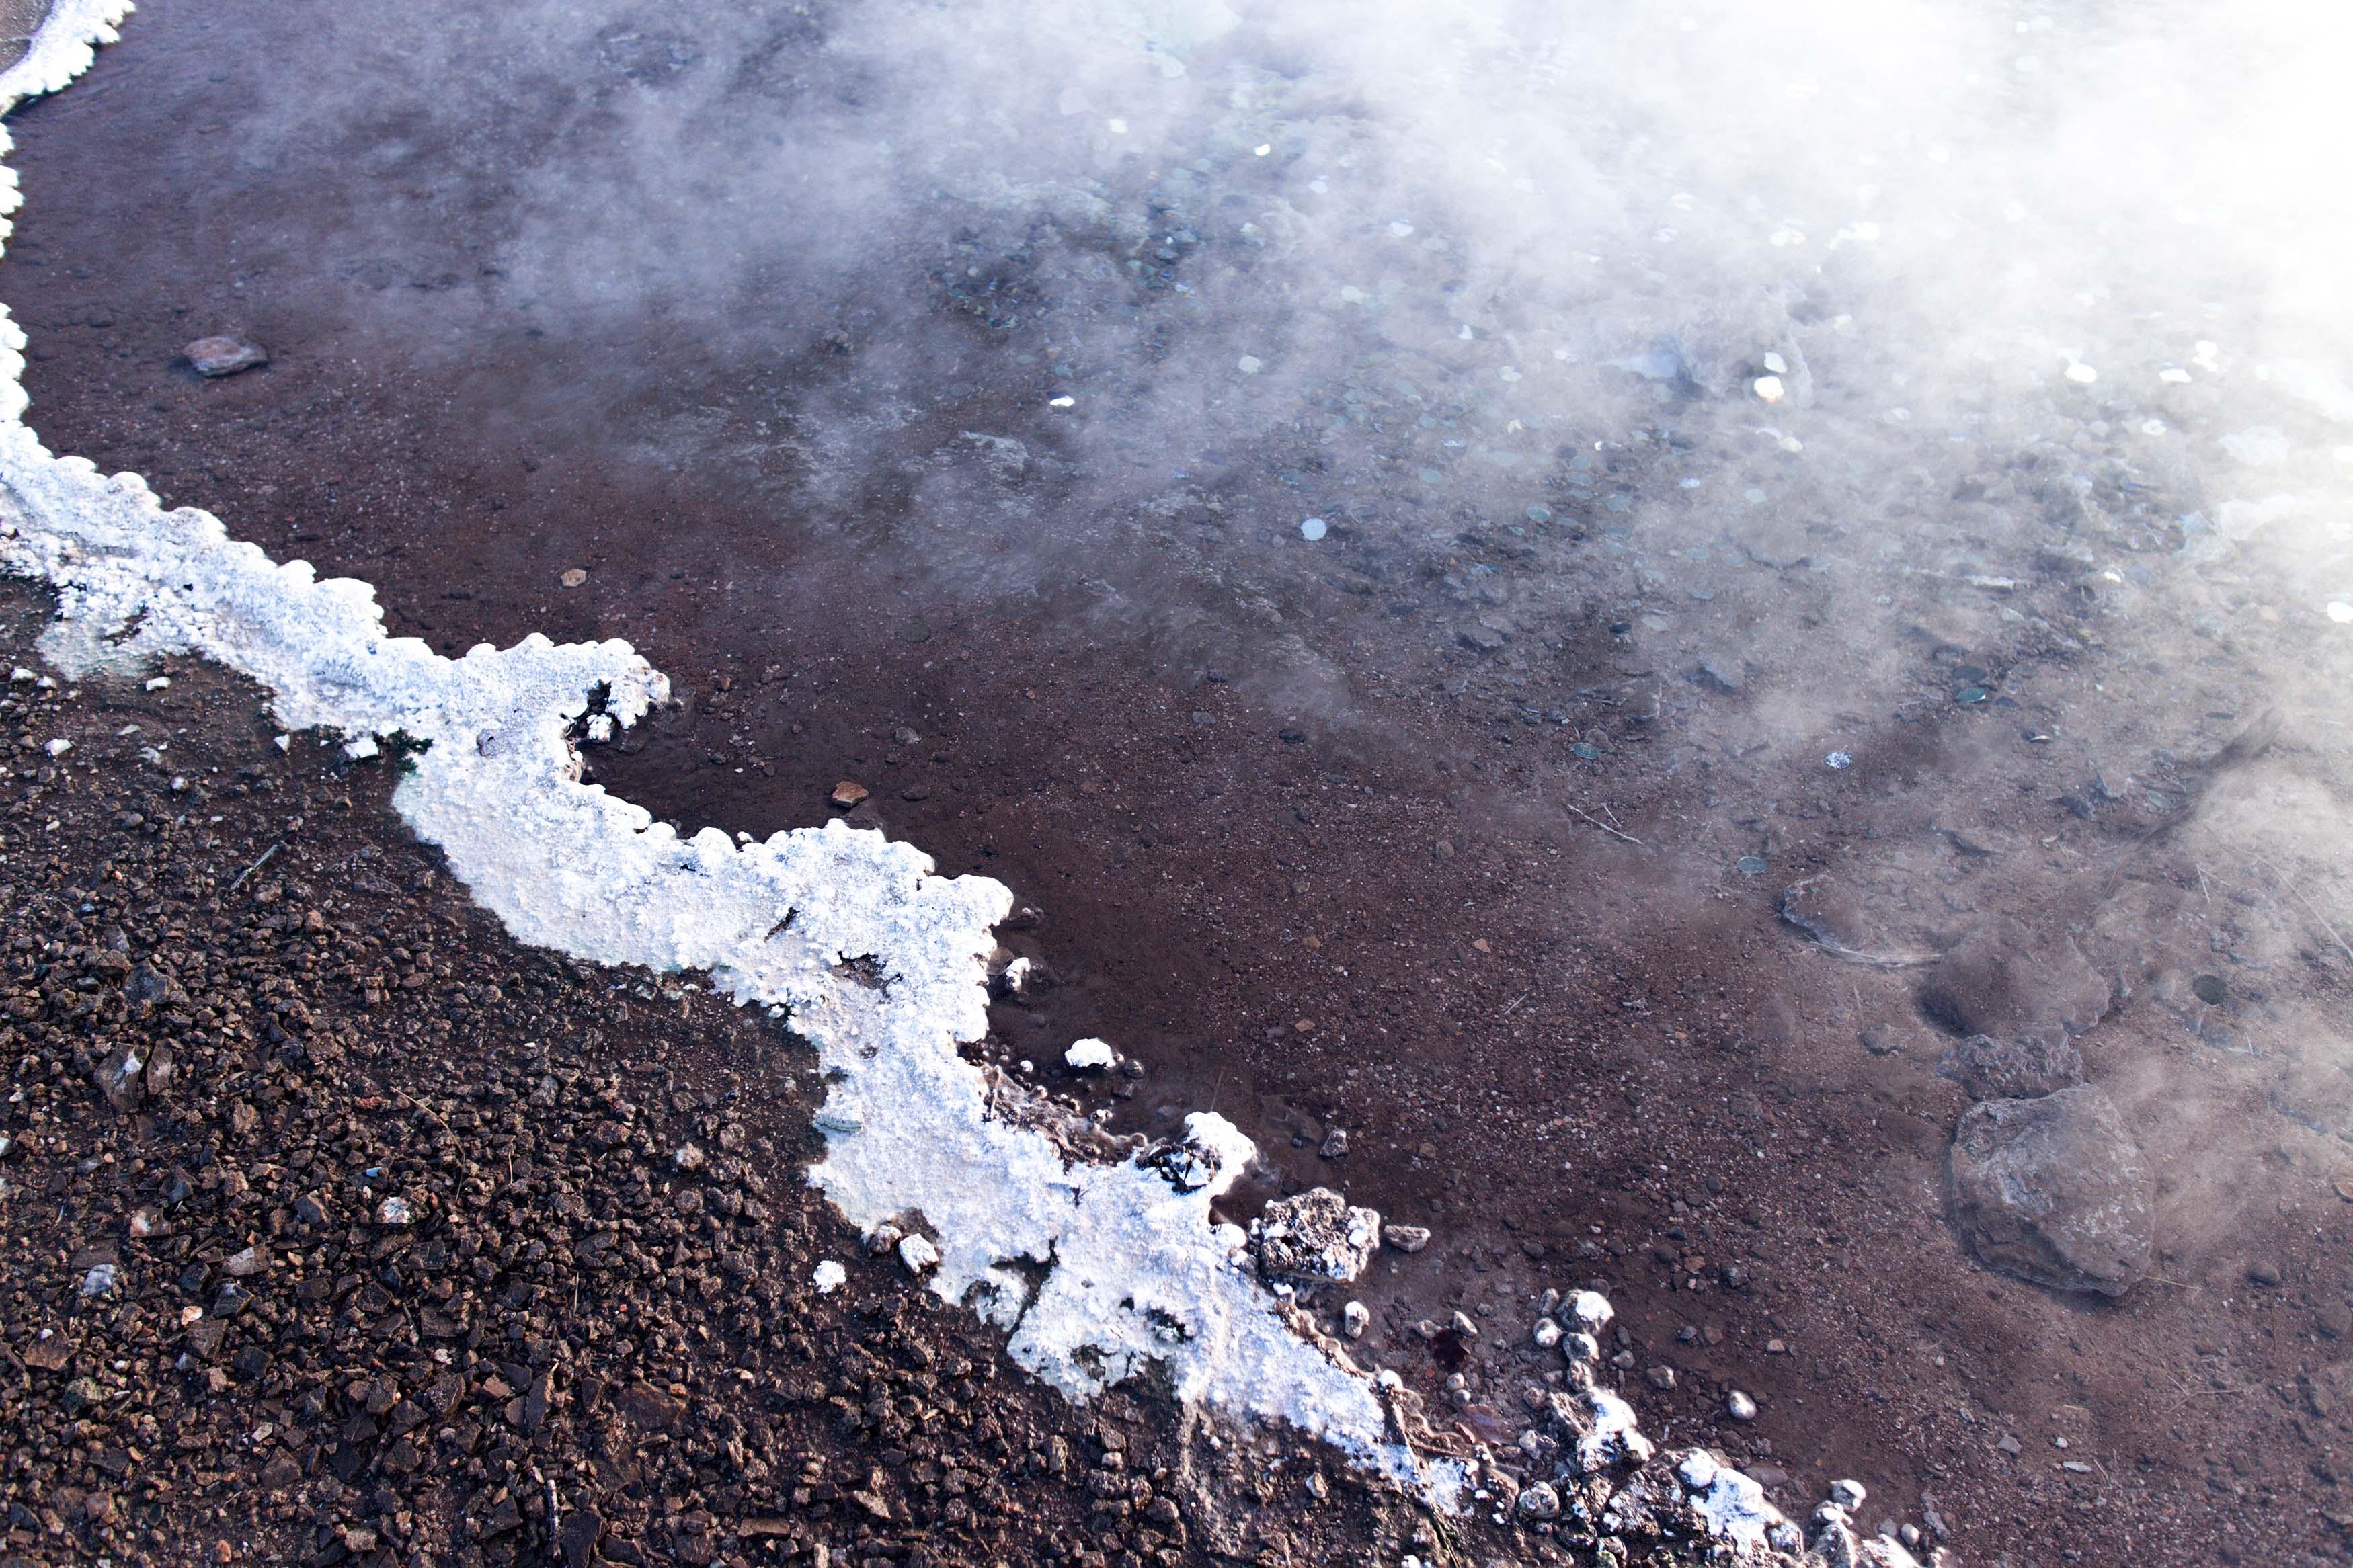 IHEARTALICE_Travel_Diary_Iceland_Geysir_03